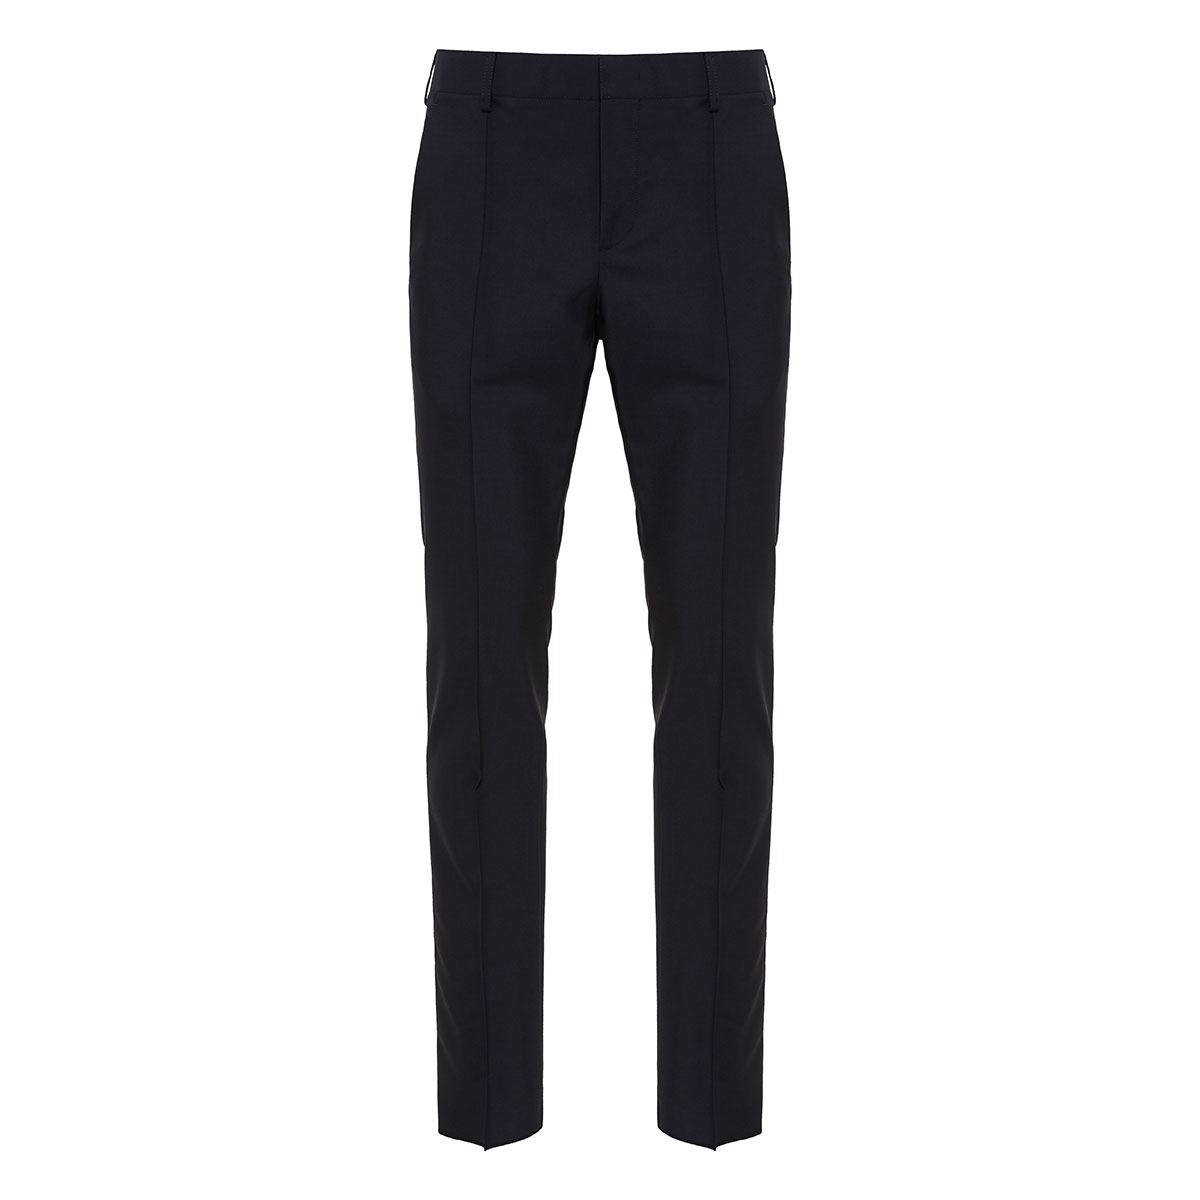 Redbroidery wool trousers